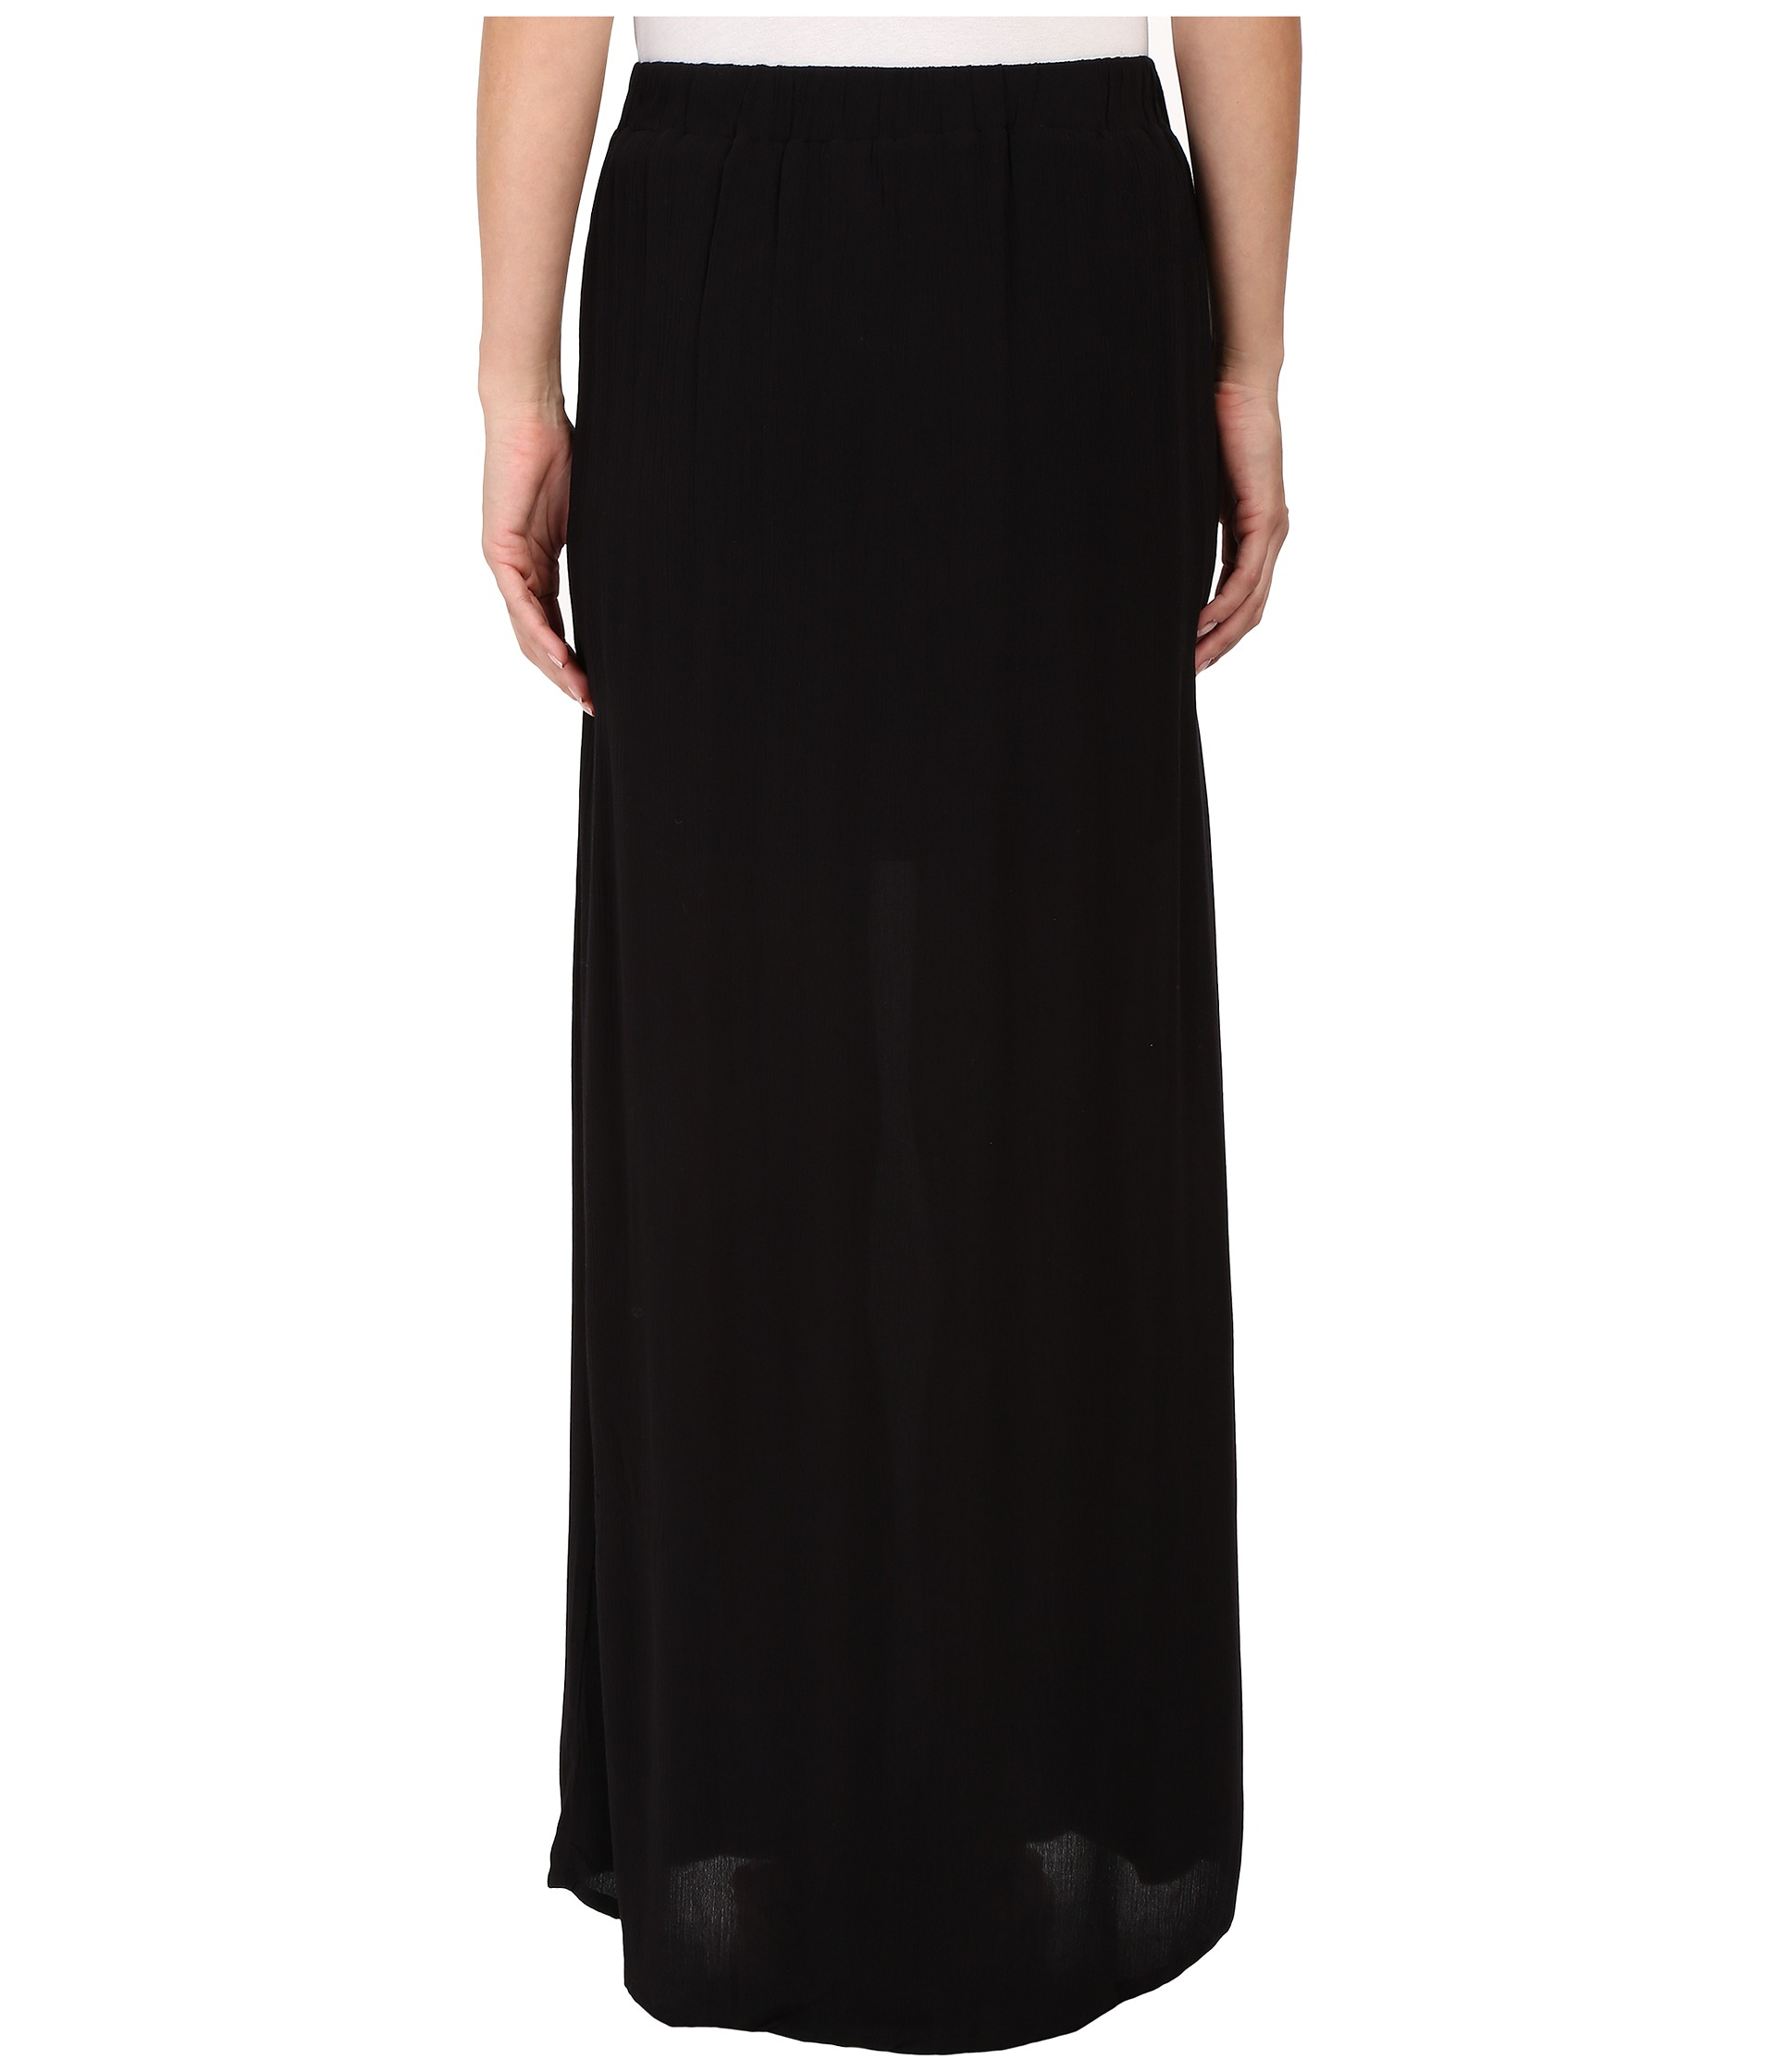 splendid rayon crinkle gauze maxi skirt in black lyst